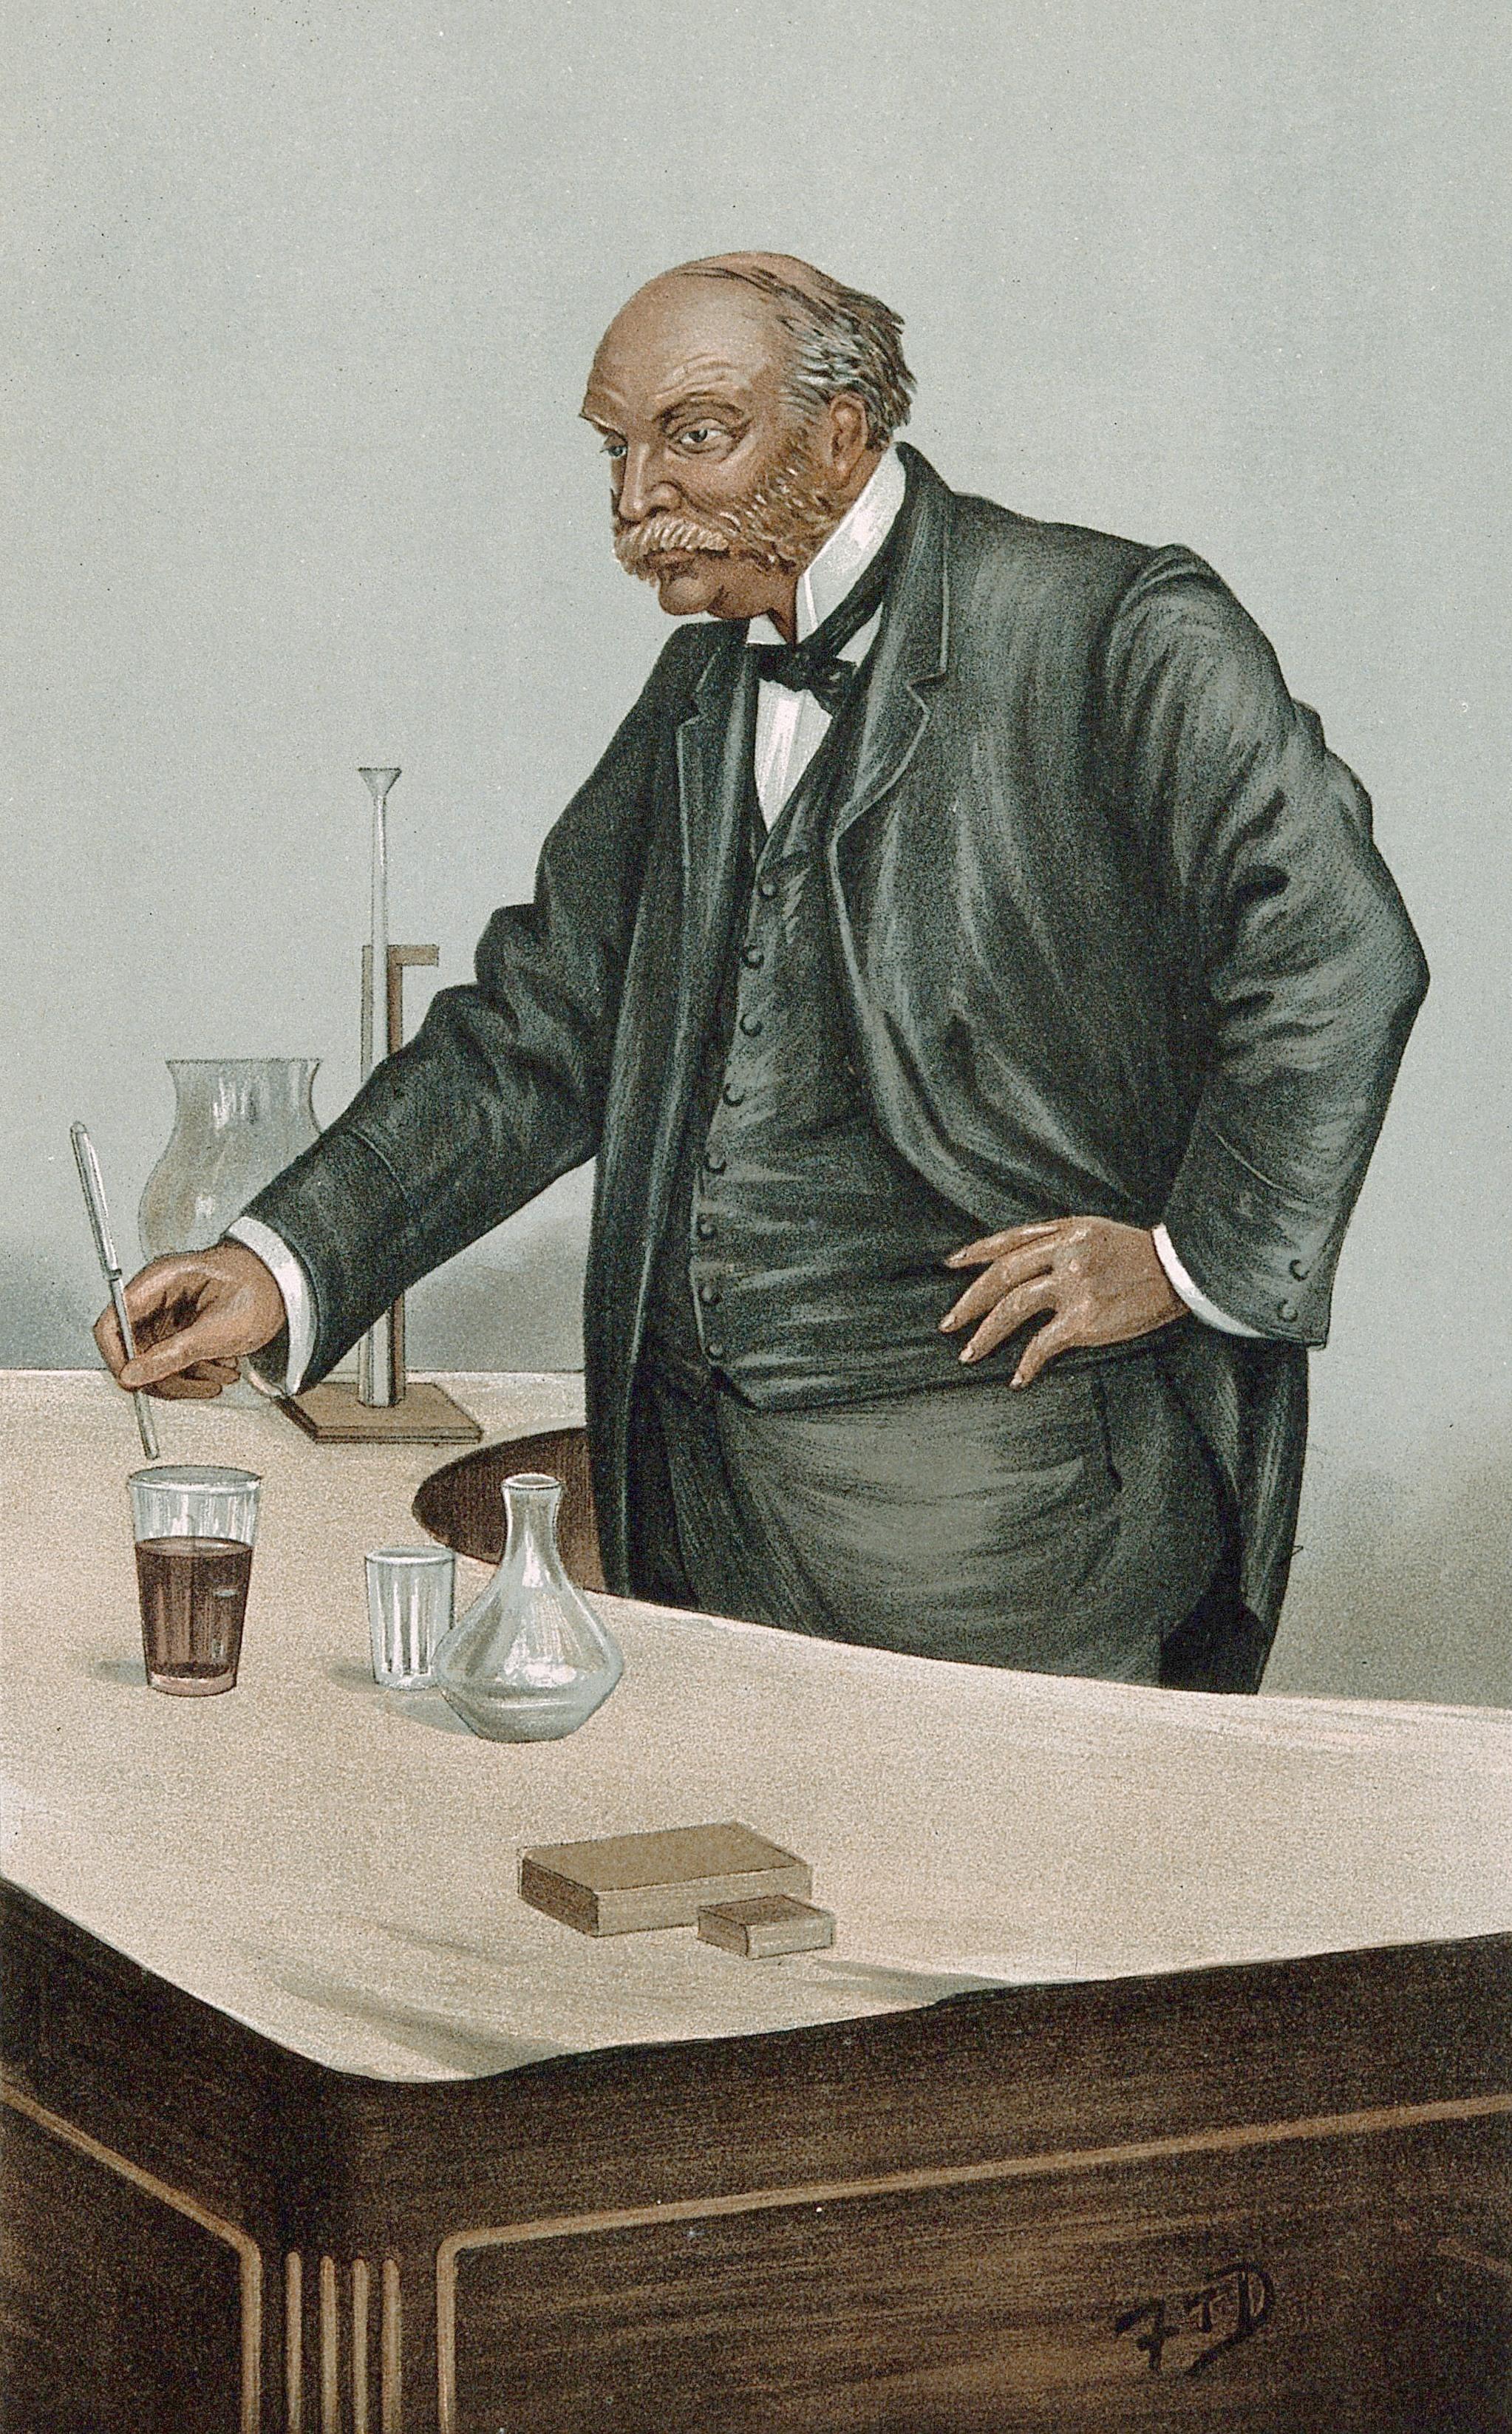 Lord Rayleigh Vanity Fair 21 December 1899